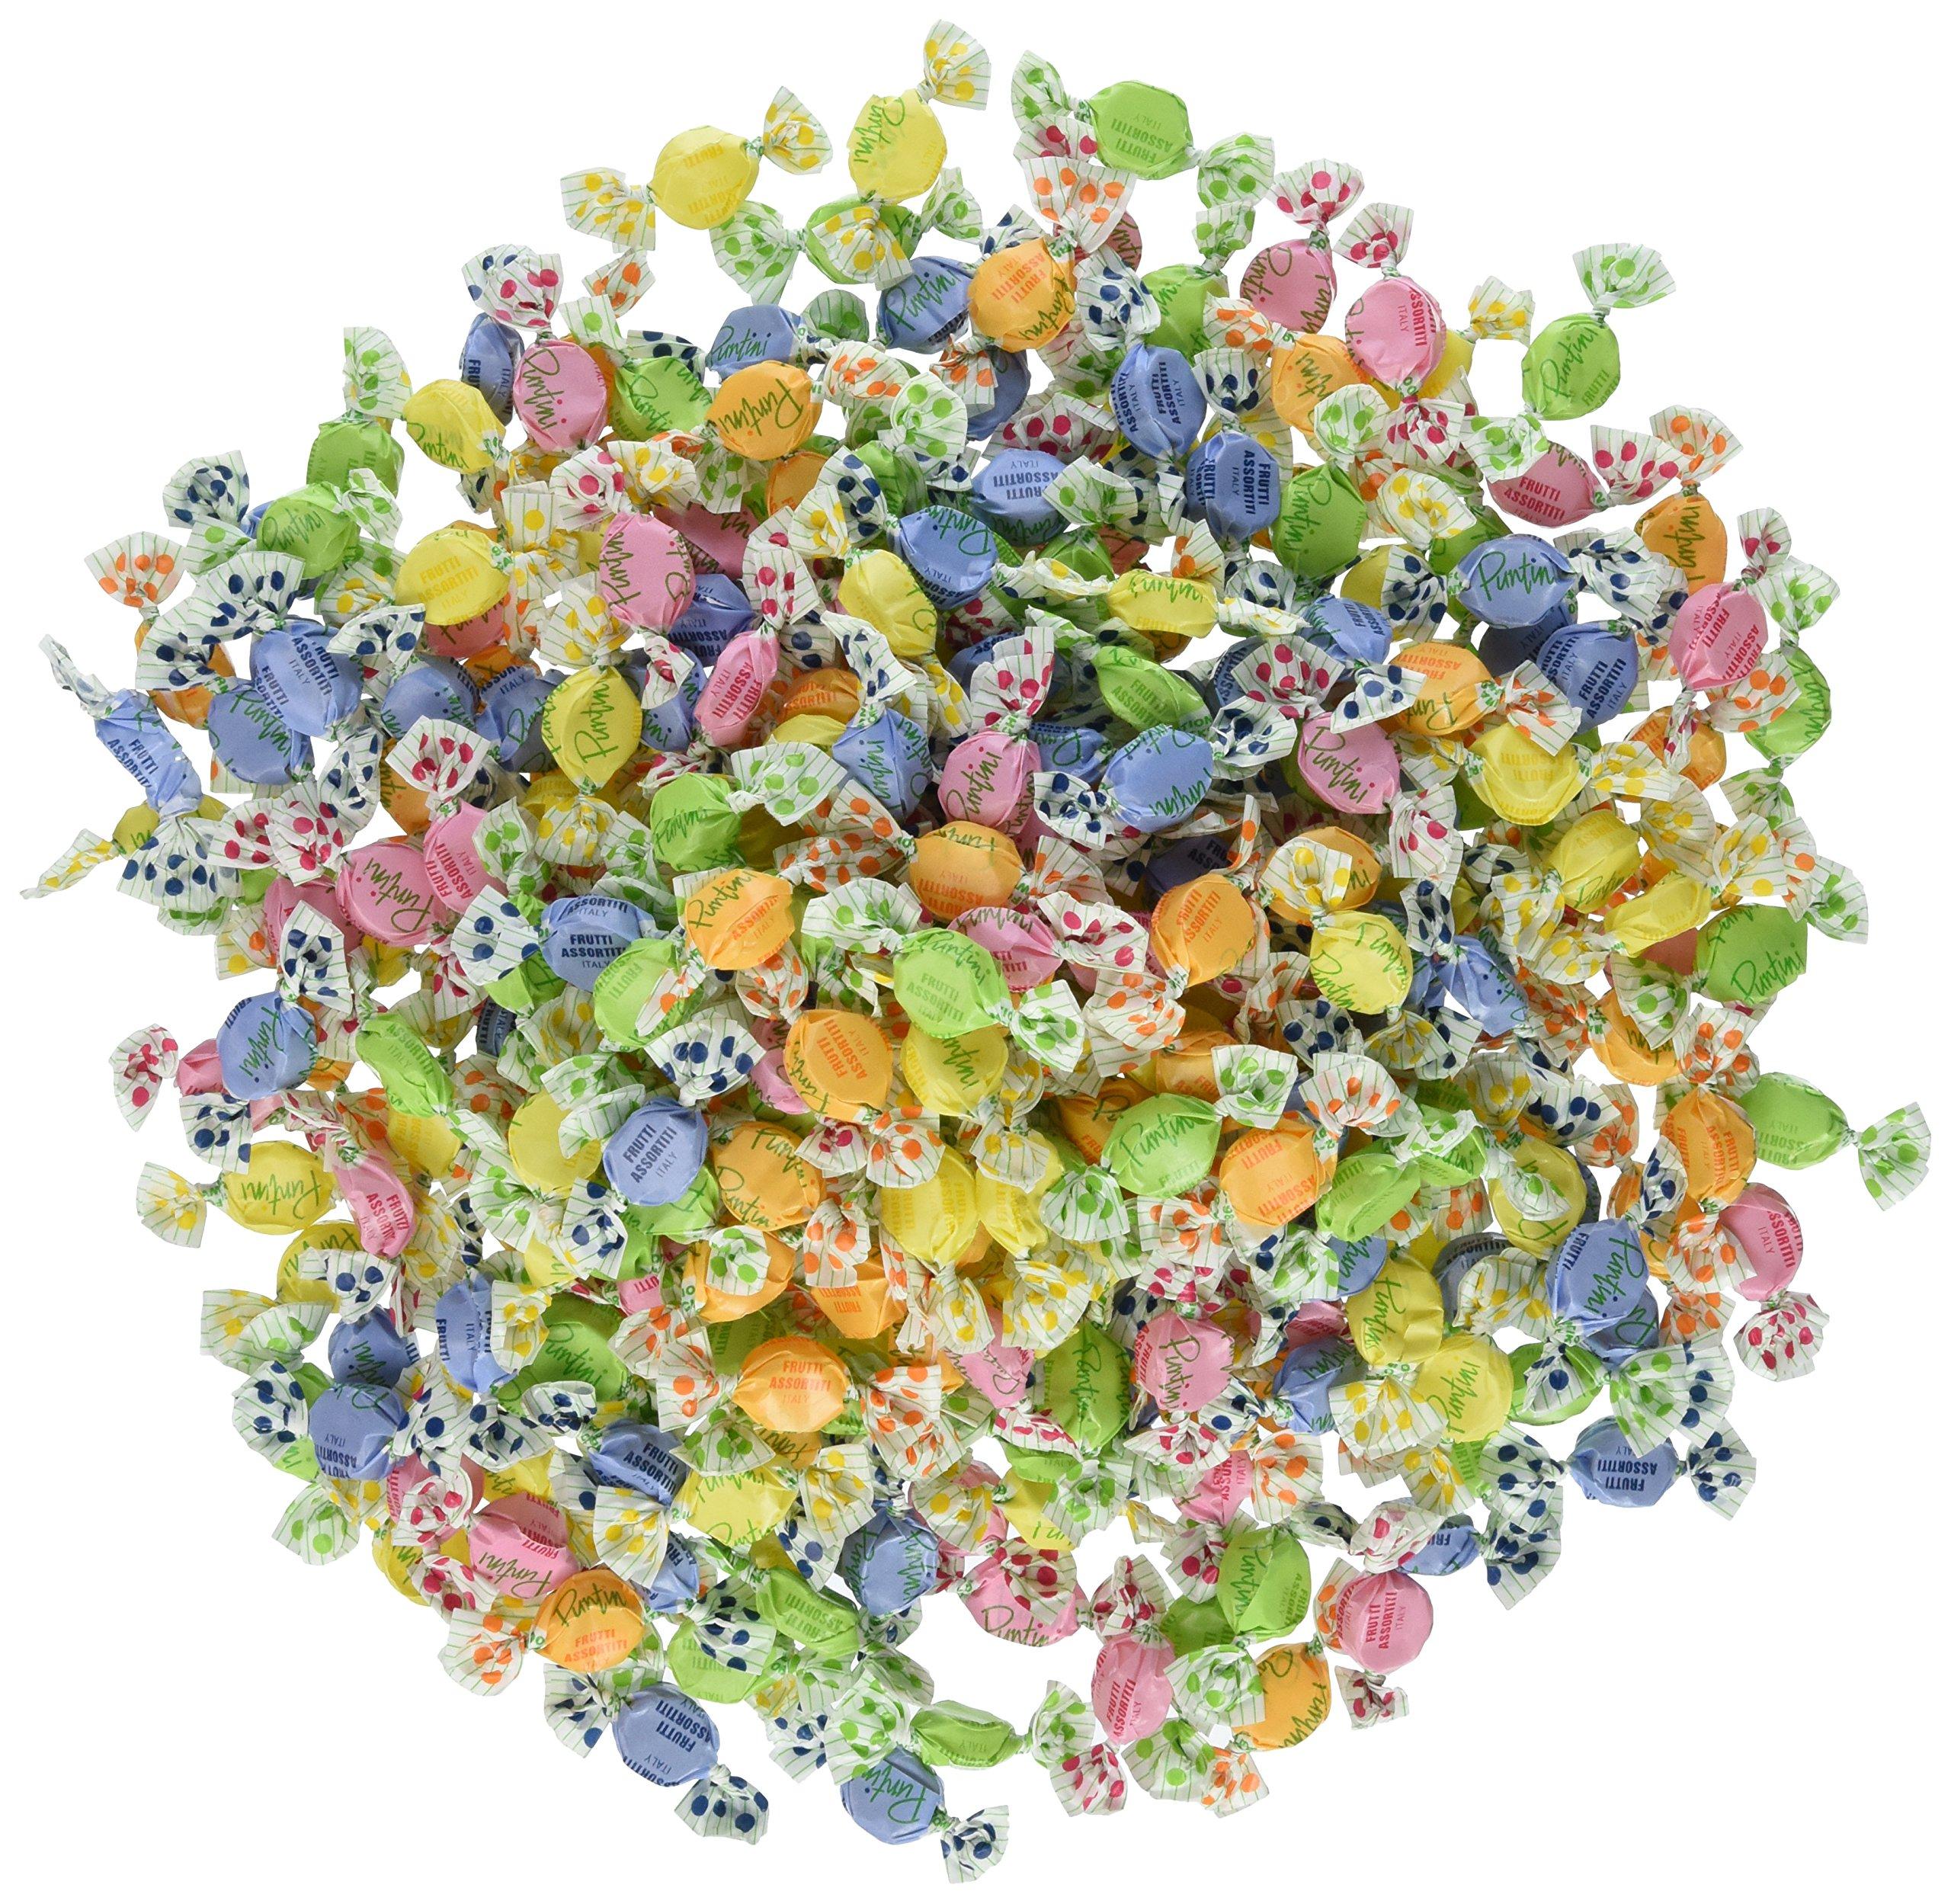 Chipurnoi Chips Puntini Fruit Candy 1300ct Bag (3 Lb 6.5 Oz)